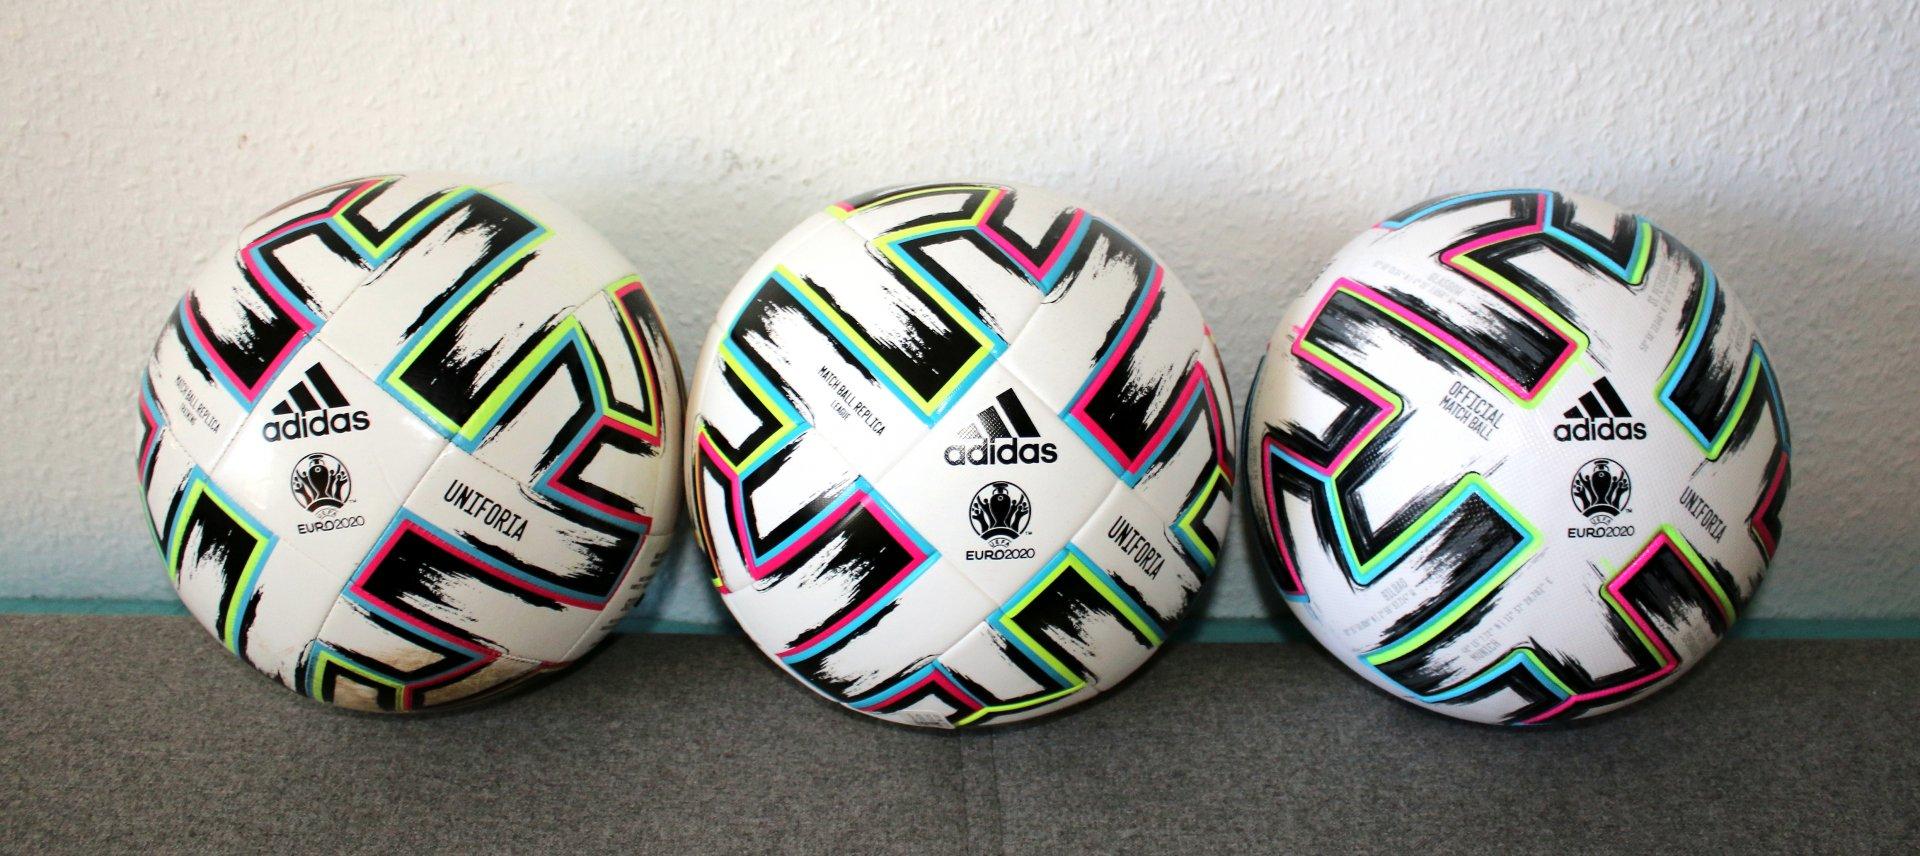 Vergleich Adidas Uniforia Bälle